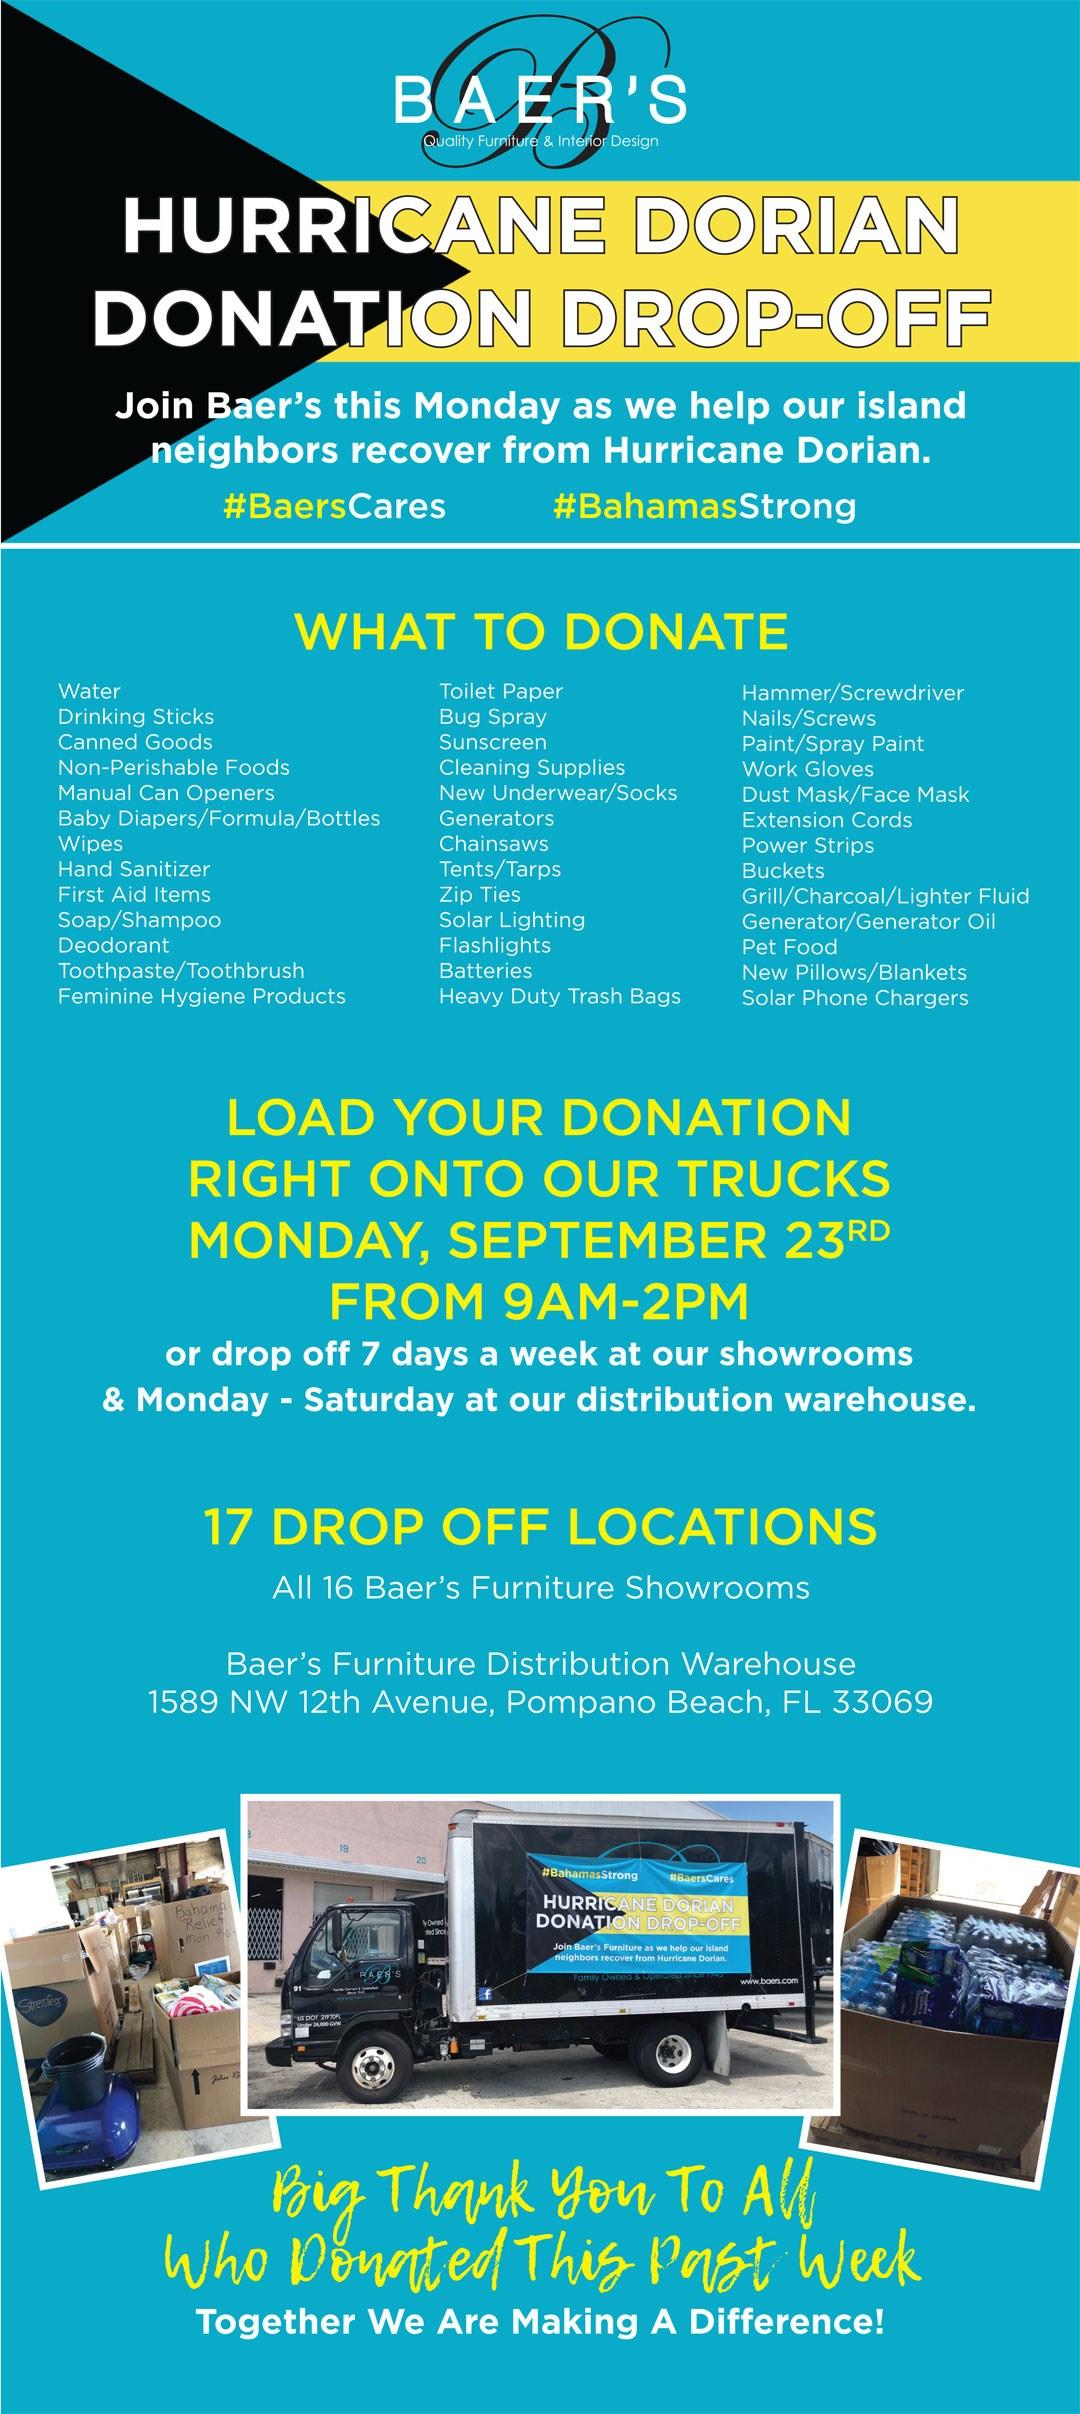 Hurricane Dorian Relief Donations